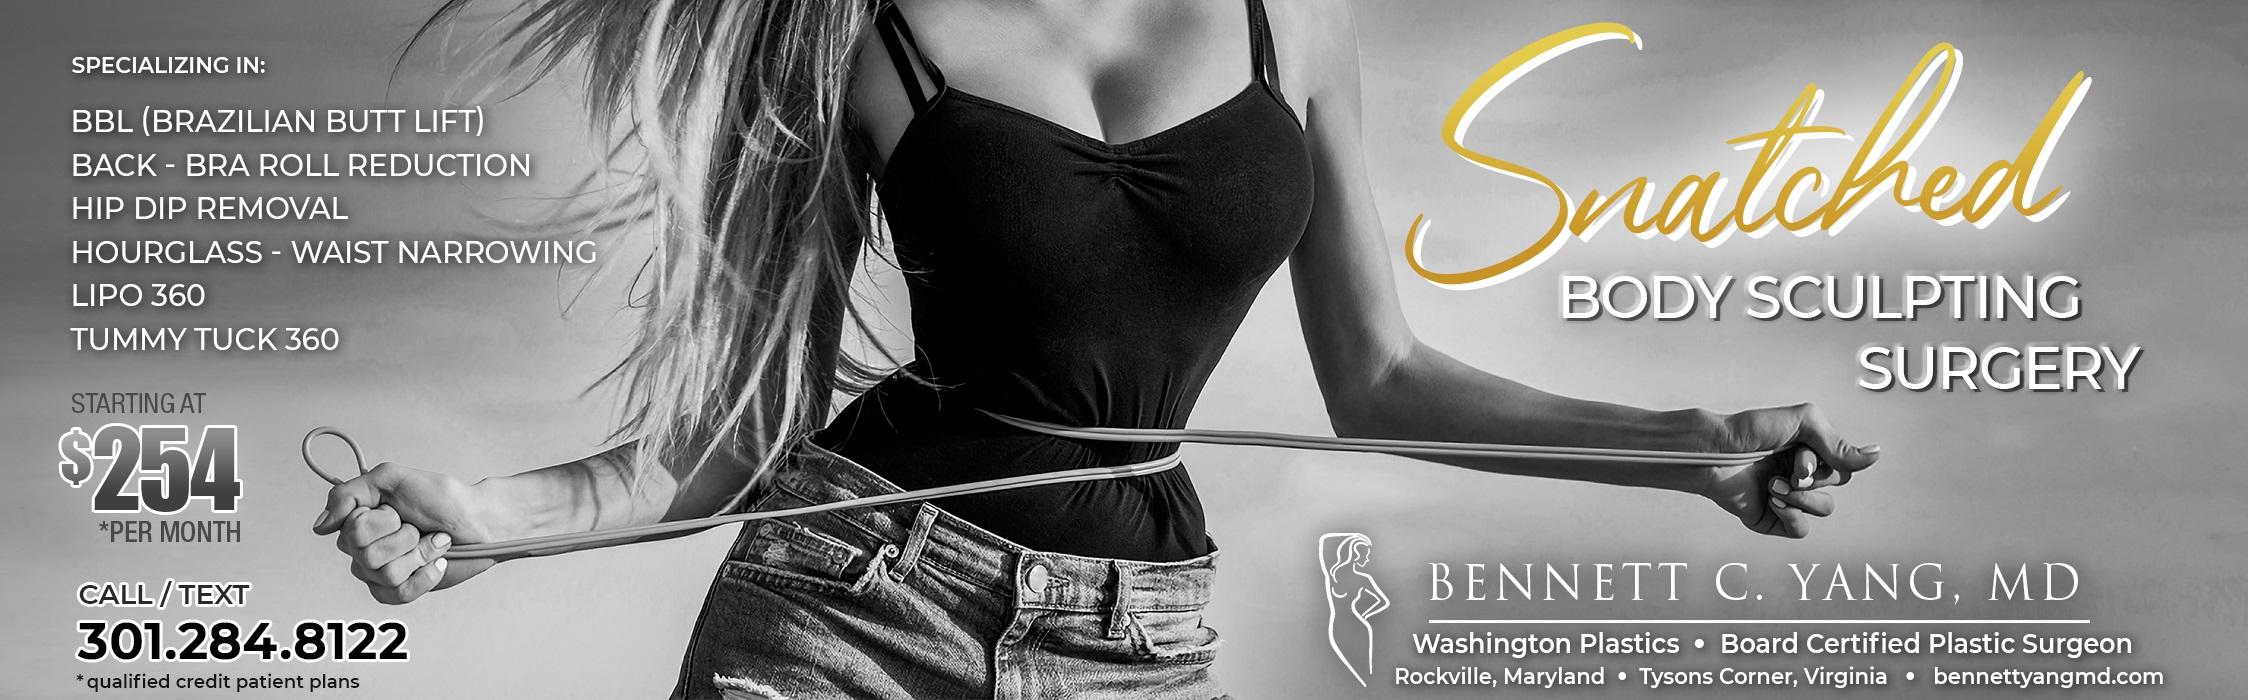 Snatched Waist BBL Maryland - Waist Narrowing Surgery